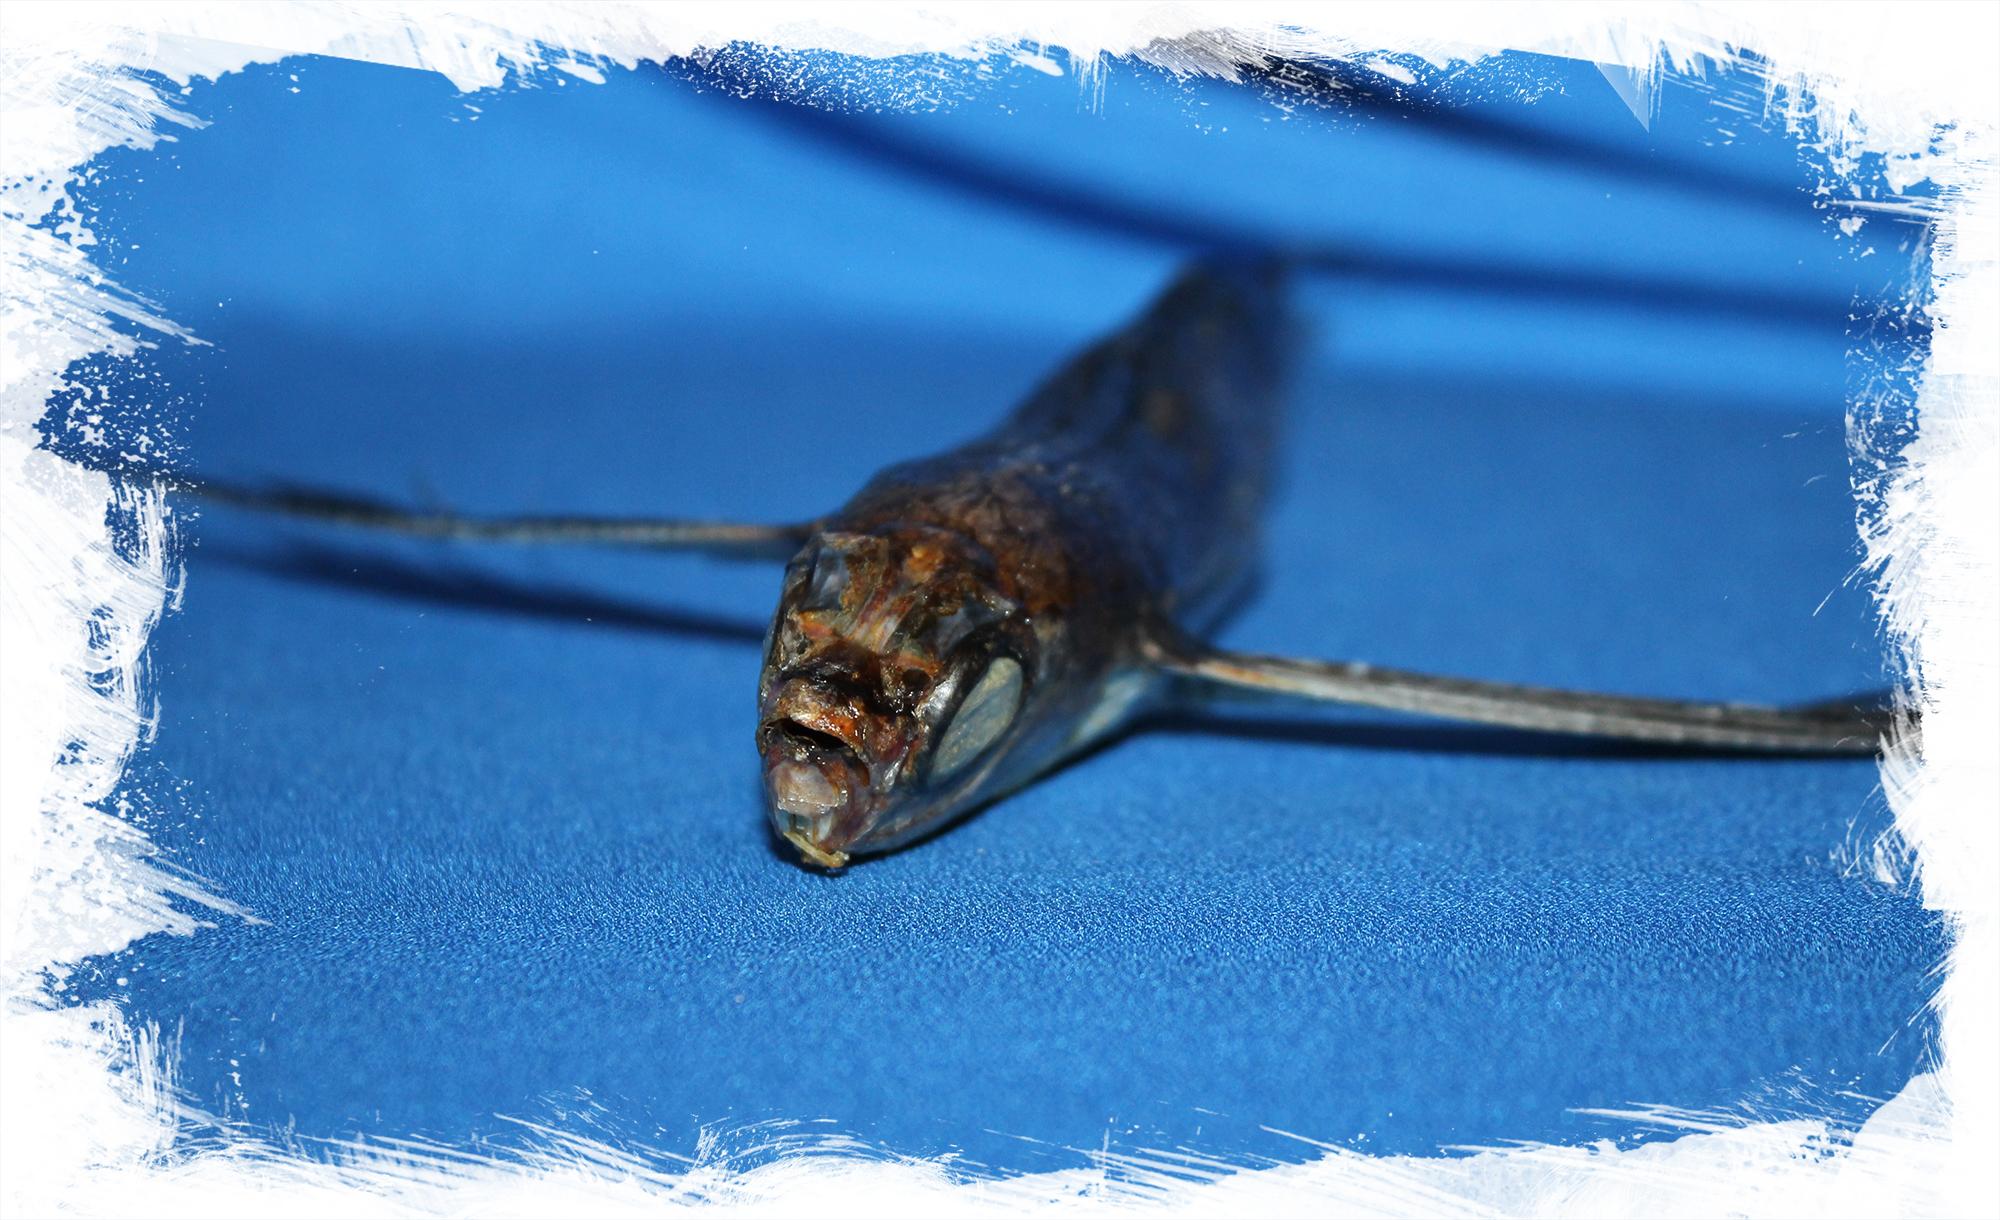 Коллекционная Летучая рыба, Exocoetus volitans